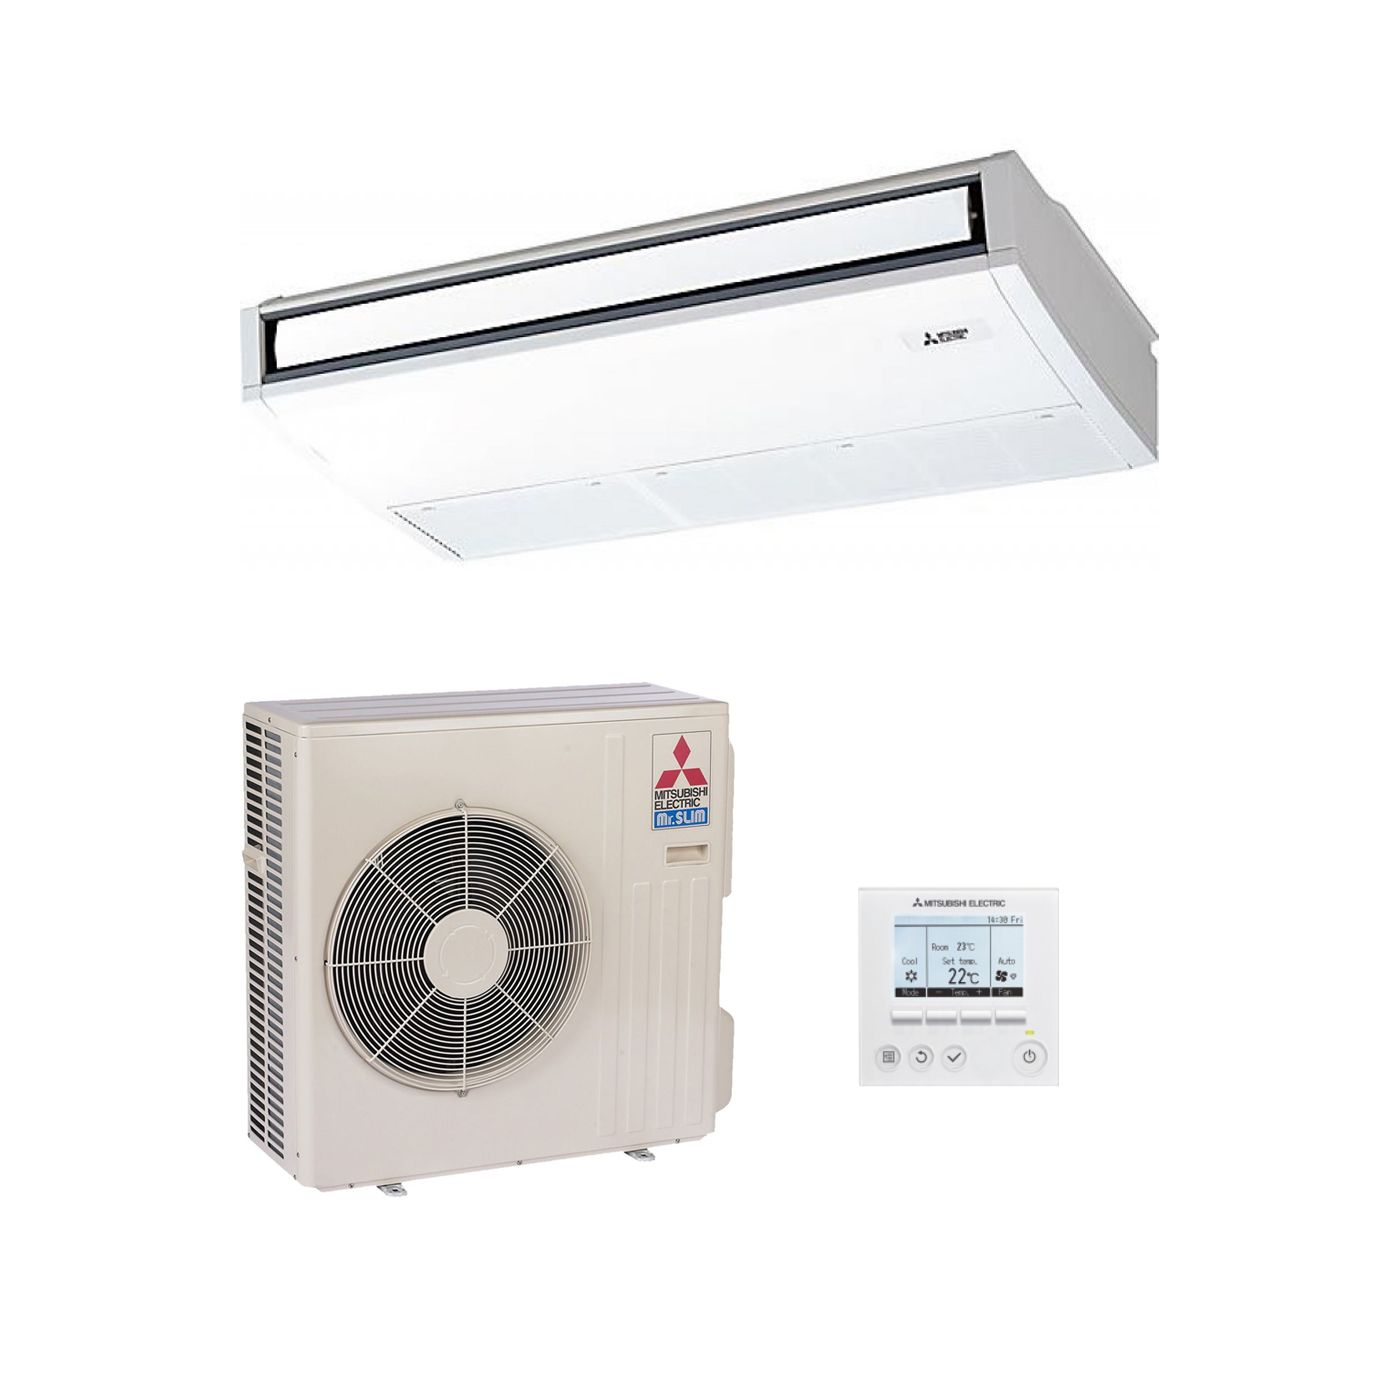 Mitsubishi Electric Air Conditioning Pca Rp125kaq Ceiling Suspended Inverter Heat Pump 12 5kw 41000btu 240v 415v 50hz